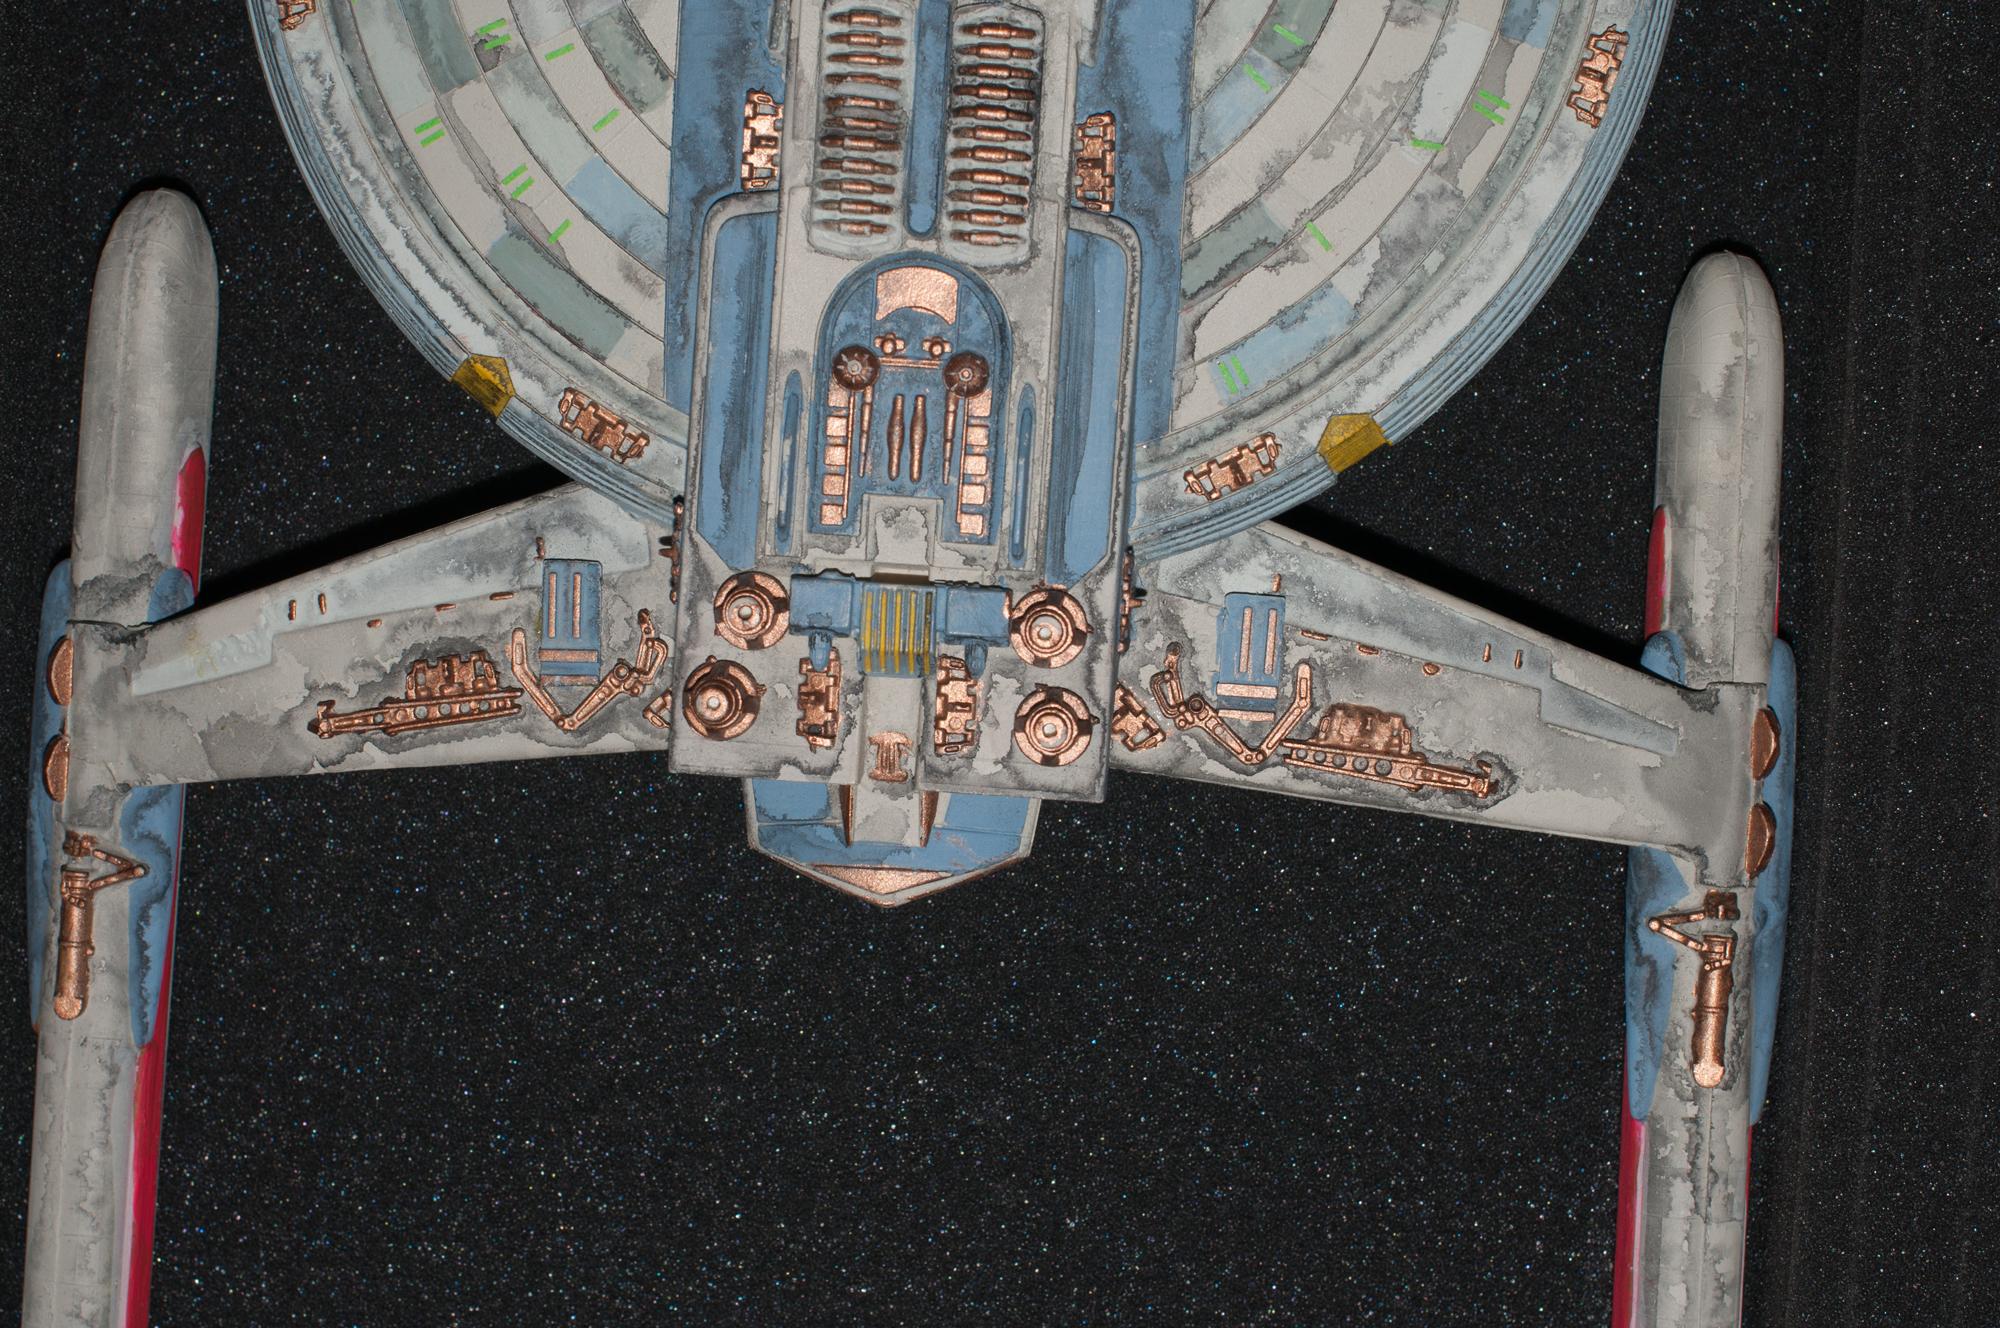 centaur detail02 png.697510